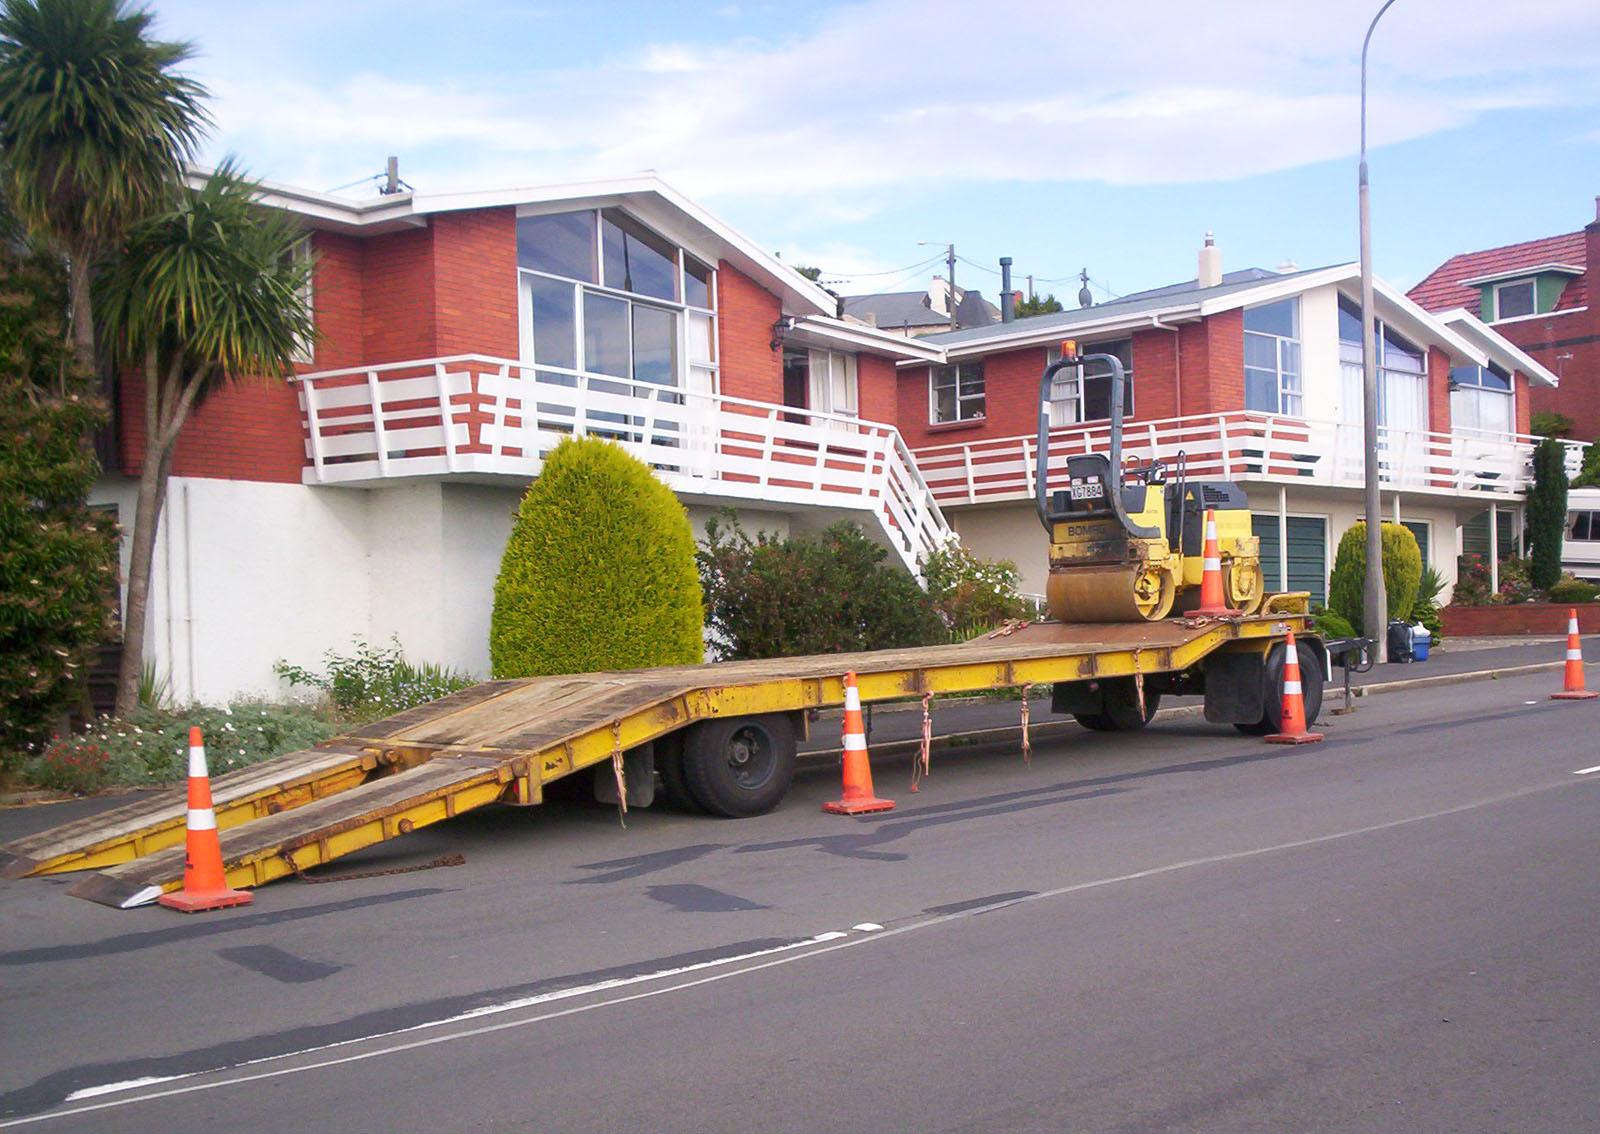 Council Works Trailer, Bspo06, Construction, Dunedin, Houses, HQ Photo